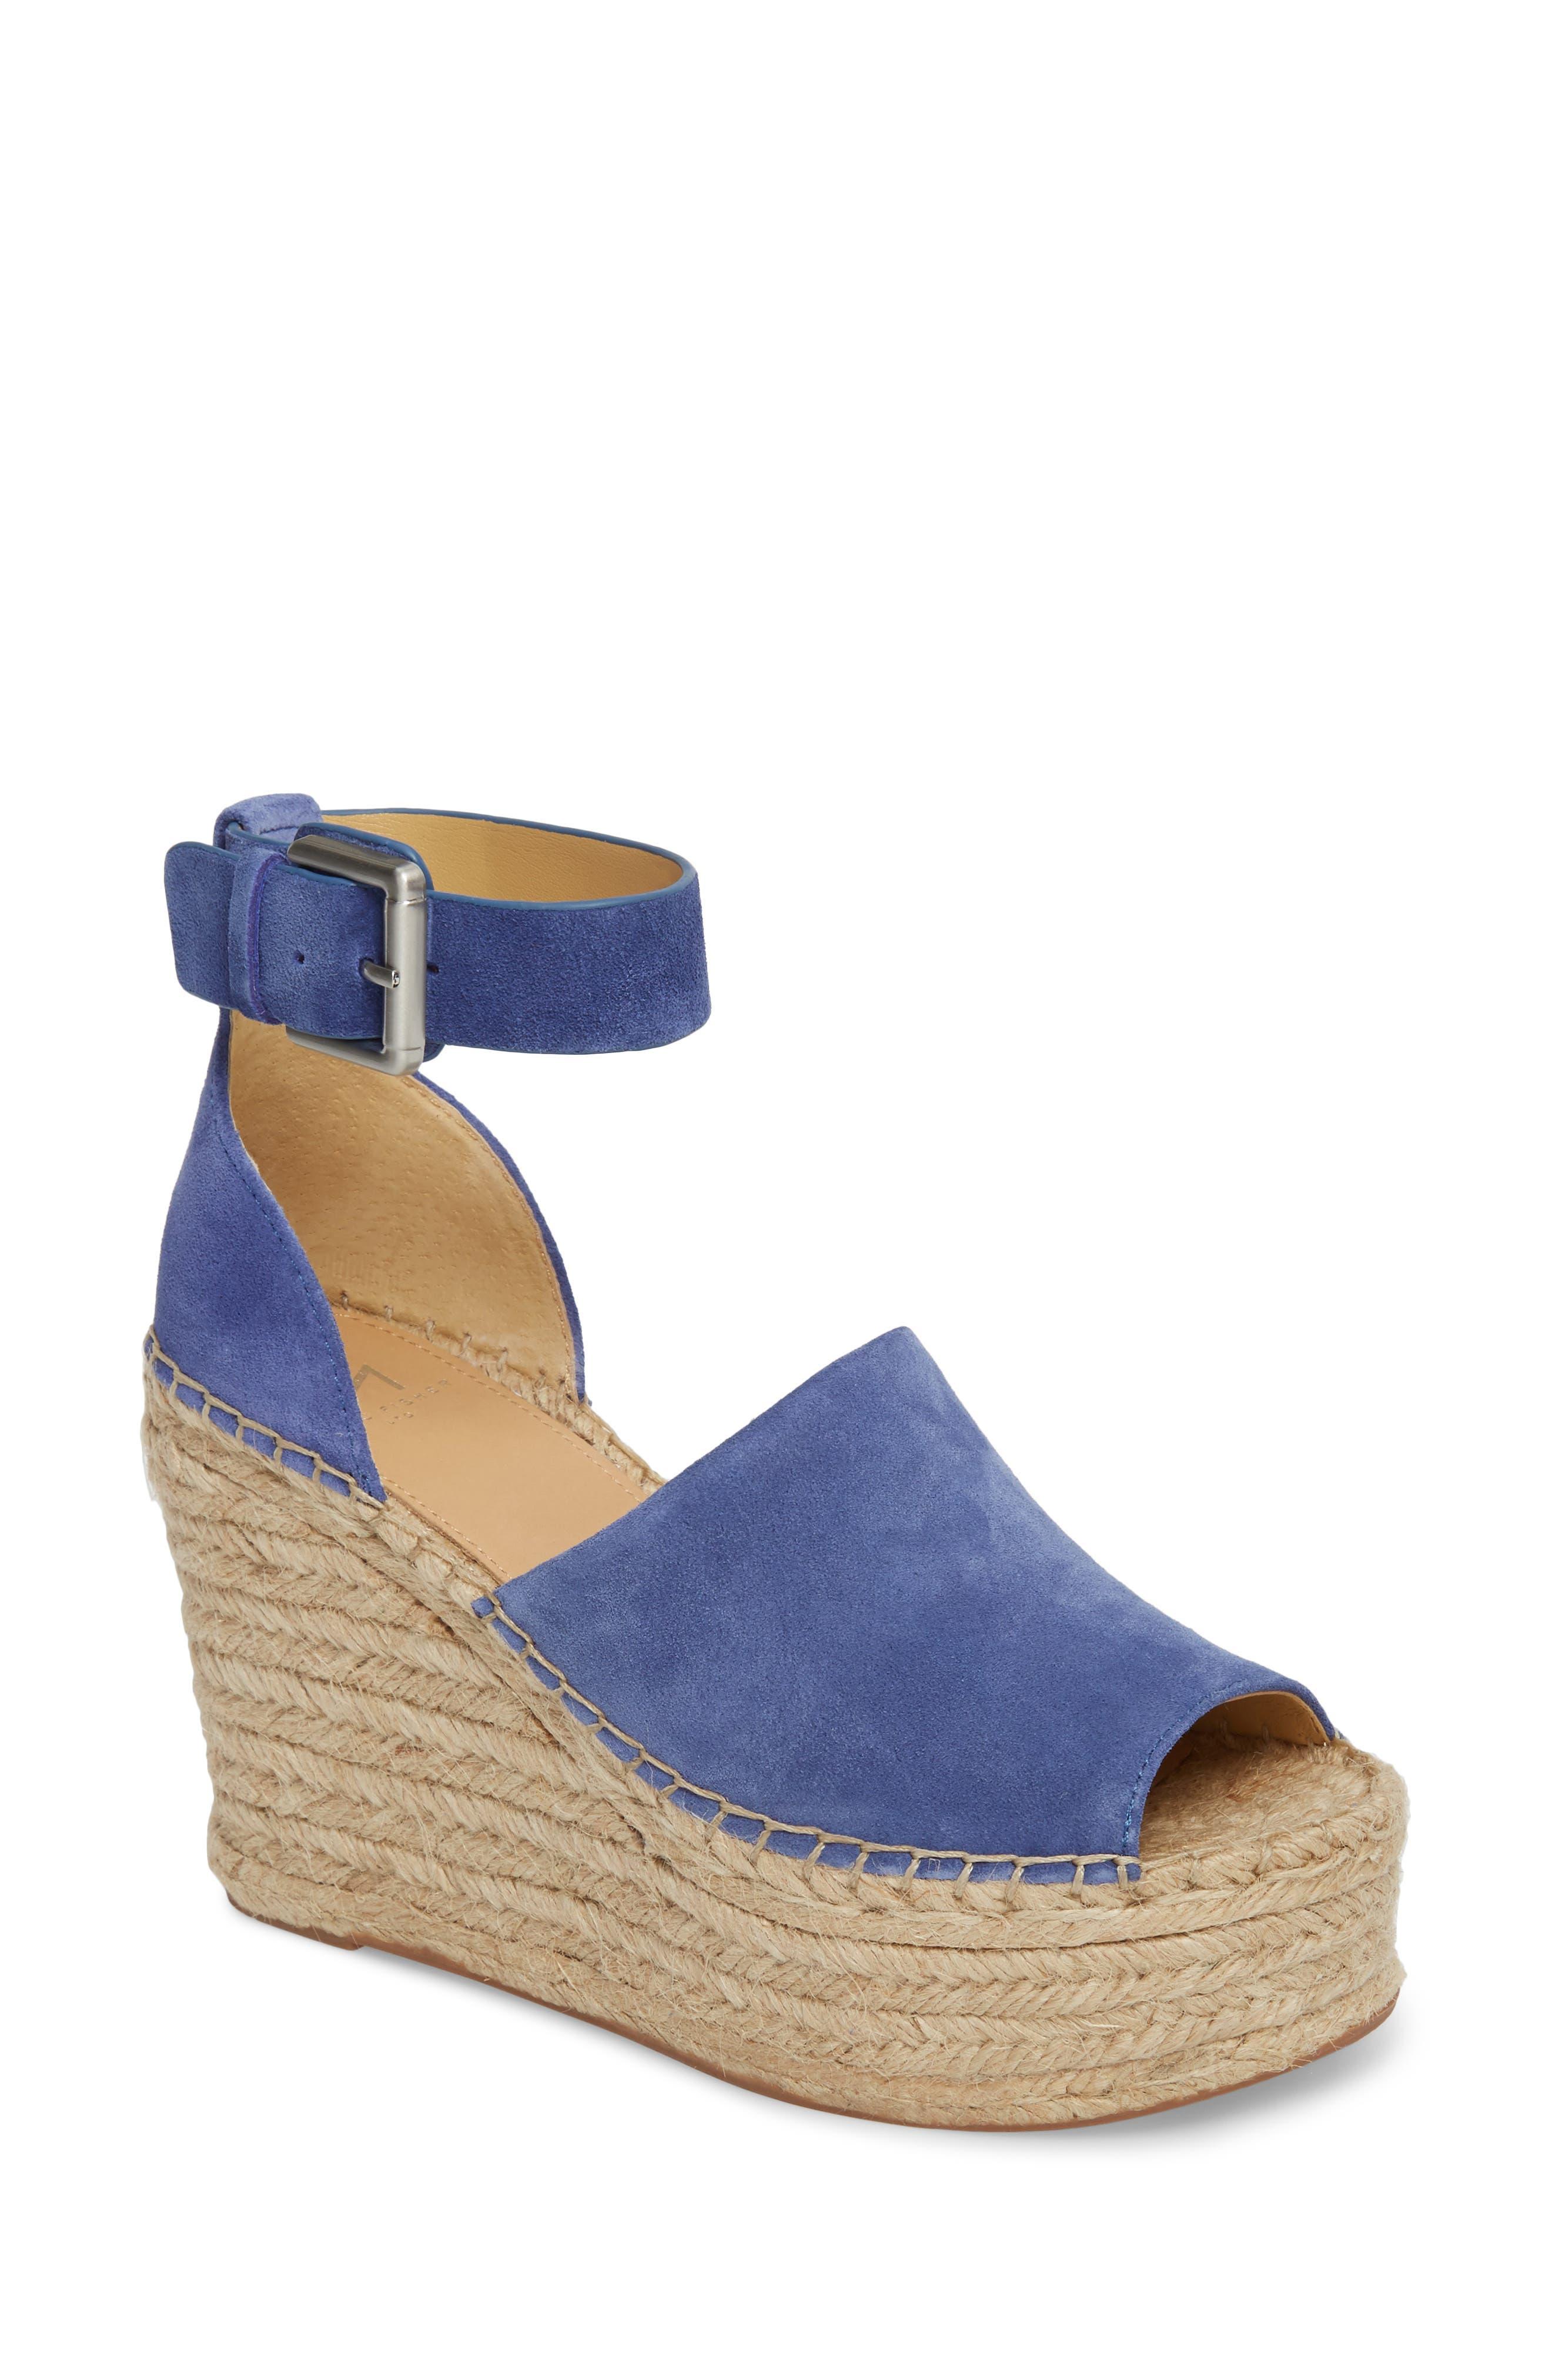 Adalyn Espadrille Wedge Sandal,                             Main thumbnail 1, color,                             BLUE SUEDE